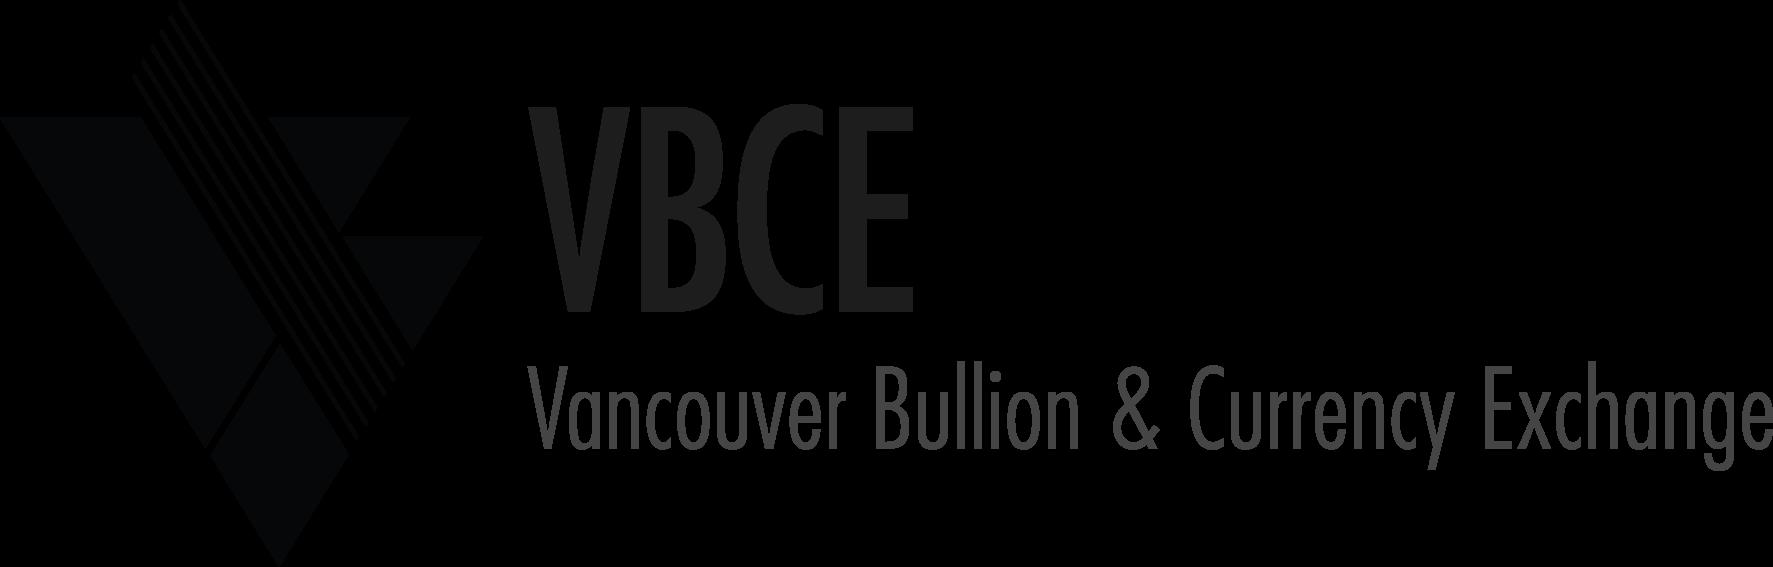 Vancouver Bullion & Currency Exchange